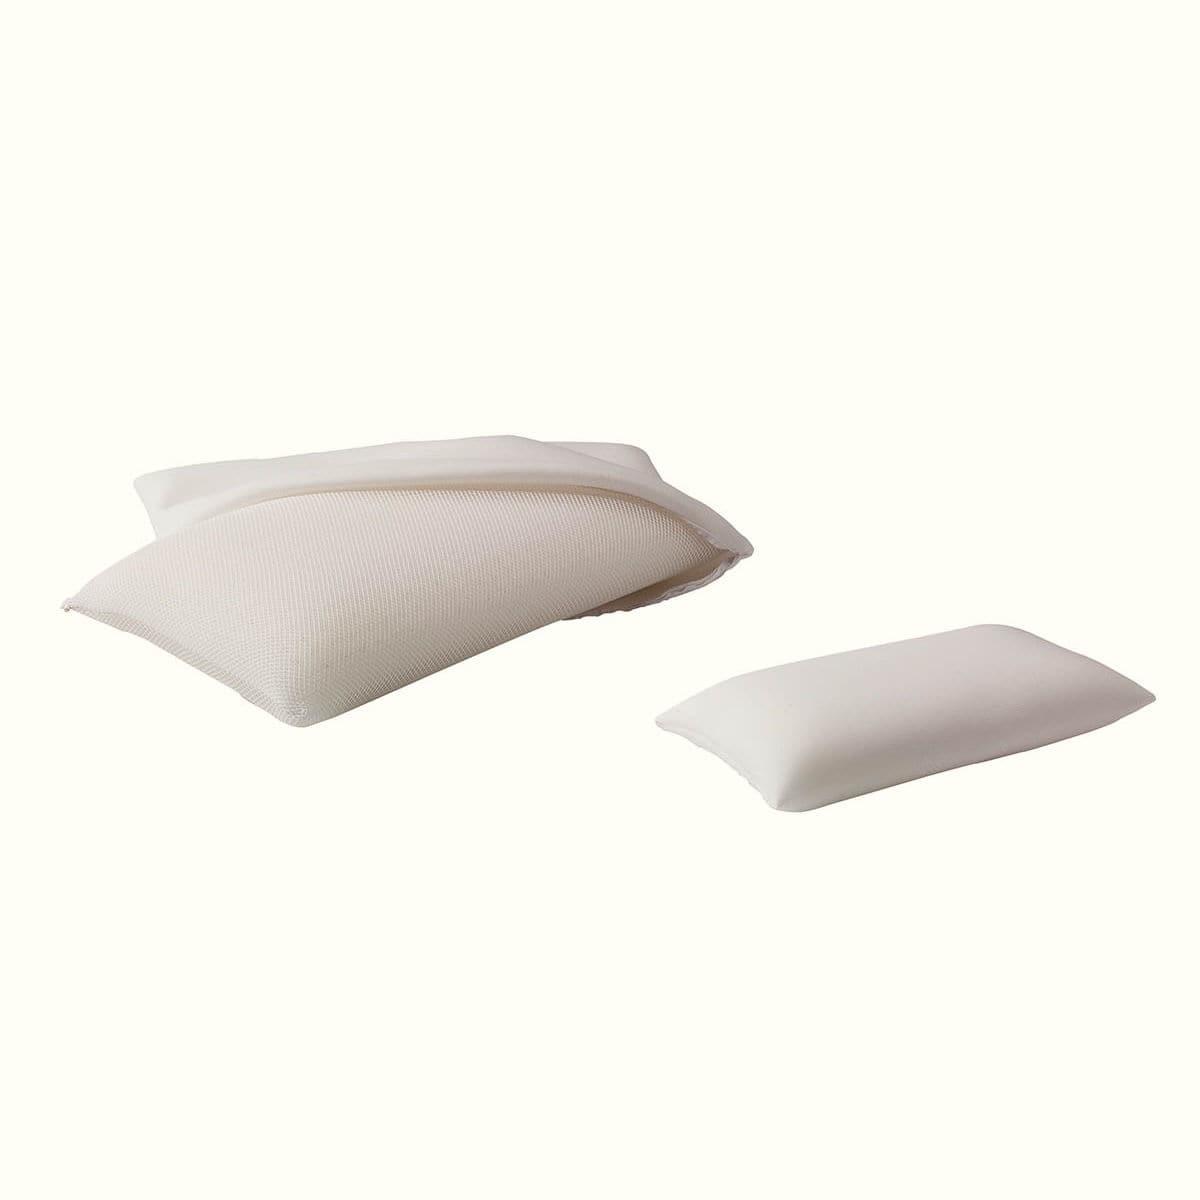 Ergonomic pillow - MEMORY AIR - Milano Bedding on clinton positioning pillow, medical knee pillow, cervical pillow, sleeping pillow, office pillow, prone position pillow, firmapedic pillow, square microbead pillow, modern pillow, vibrating pillow, orthopedic pillow, beautiful pillow, love pillow, side sleeper pillow, throw pillow, standard pillow, eye pillow, expandable pillow, 6 body pillow, massage pillow, lazy lambert ergo pillow, horseshoe shaped pillow,